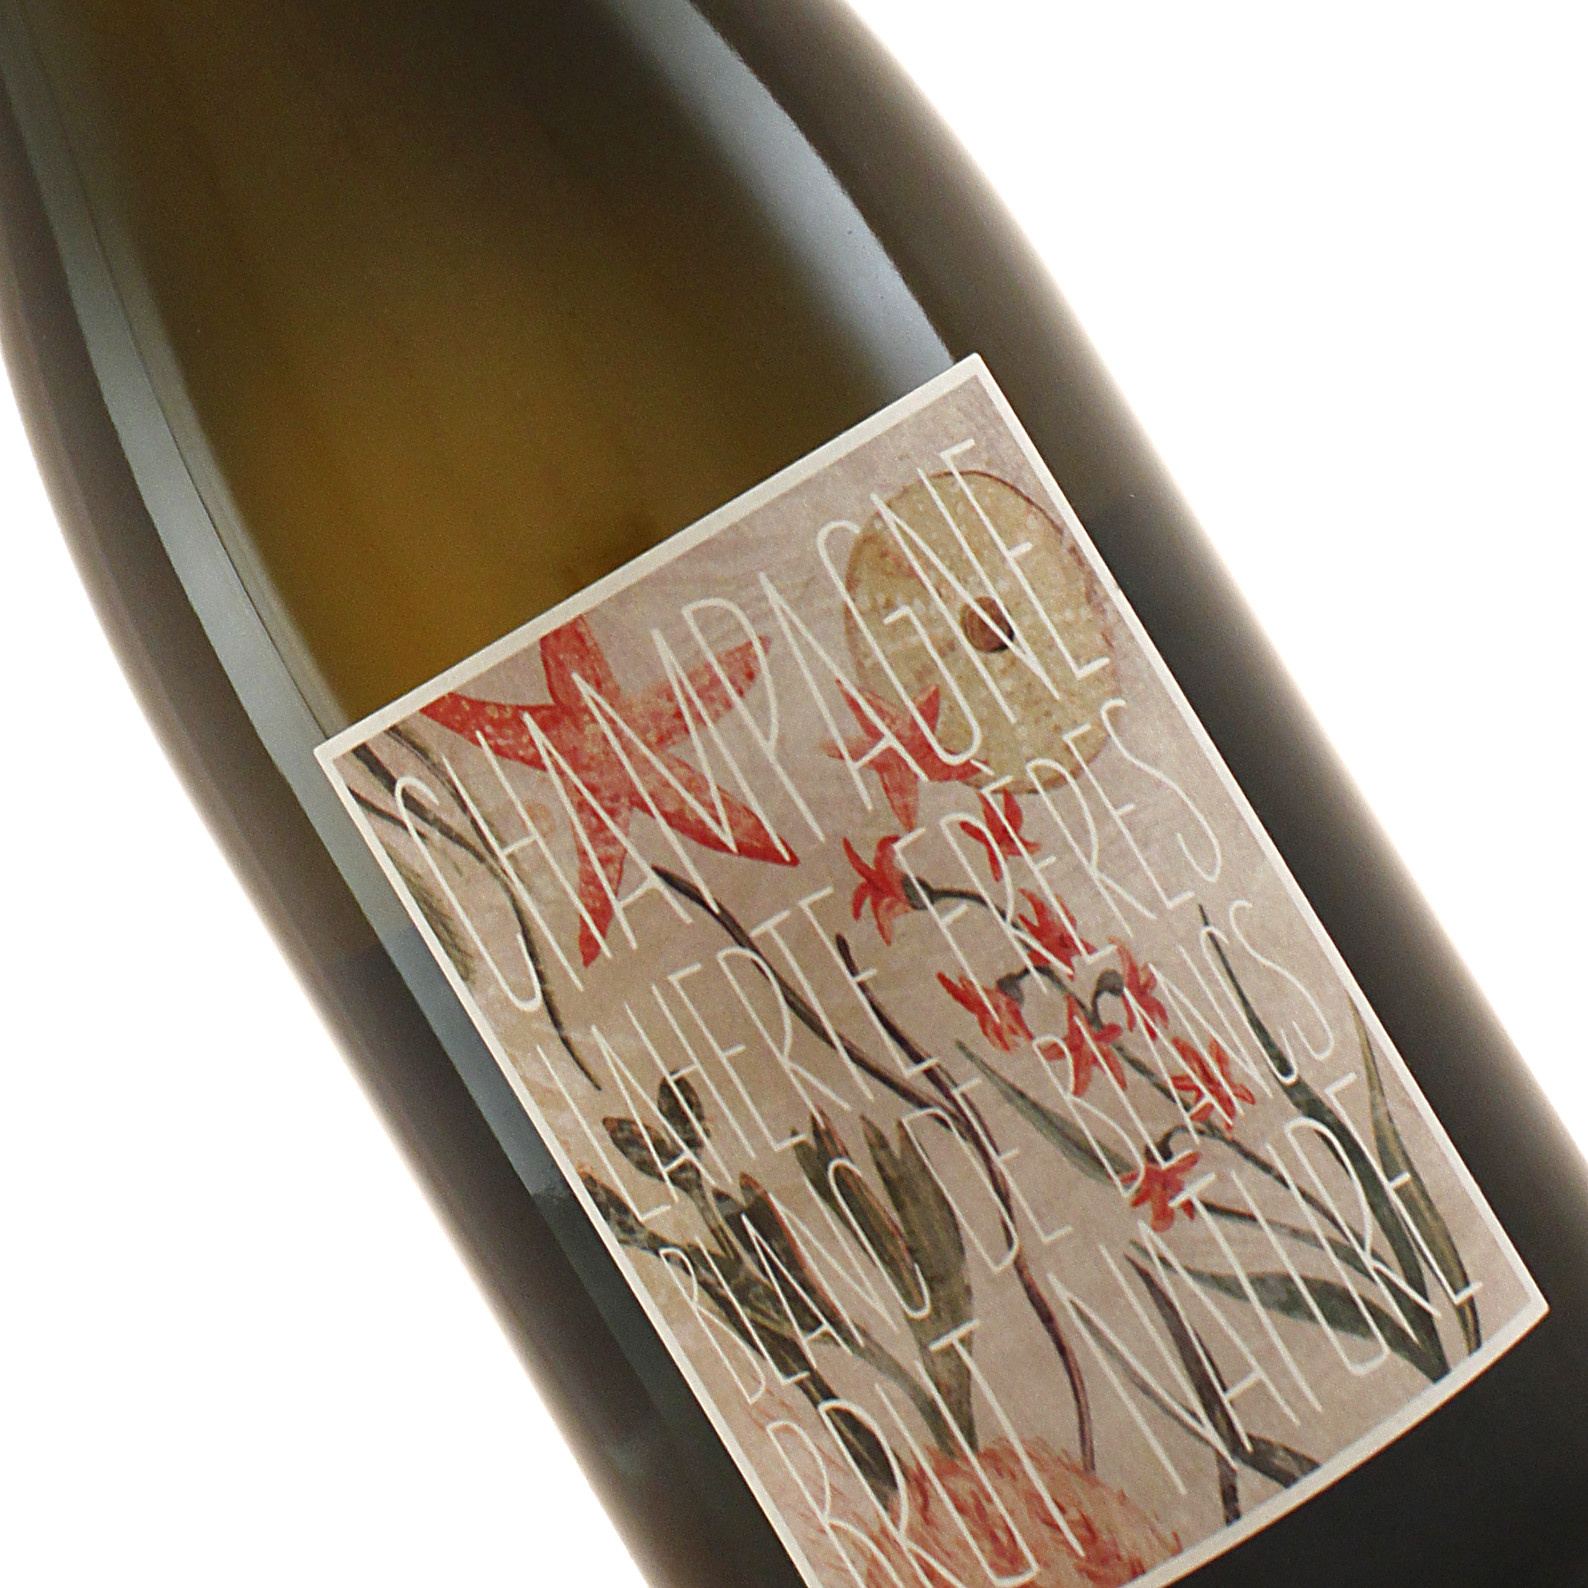 Laherte Freres N.V. Champagne Blanc de Blancs Brut Nature, Chavot